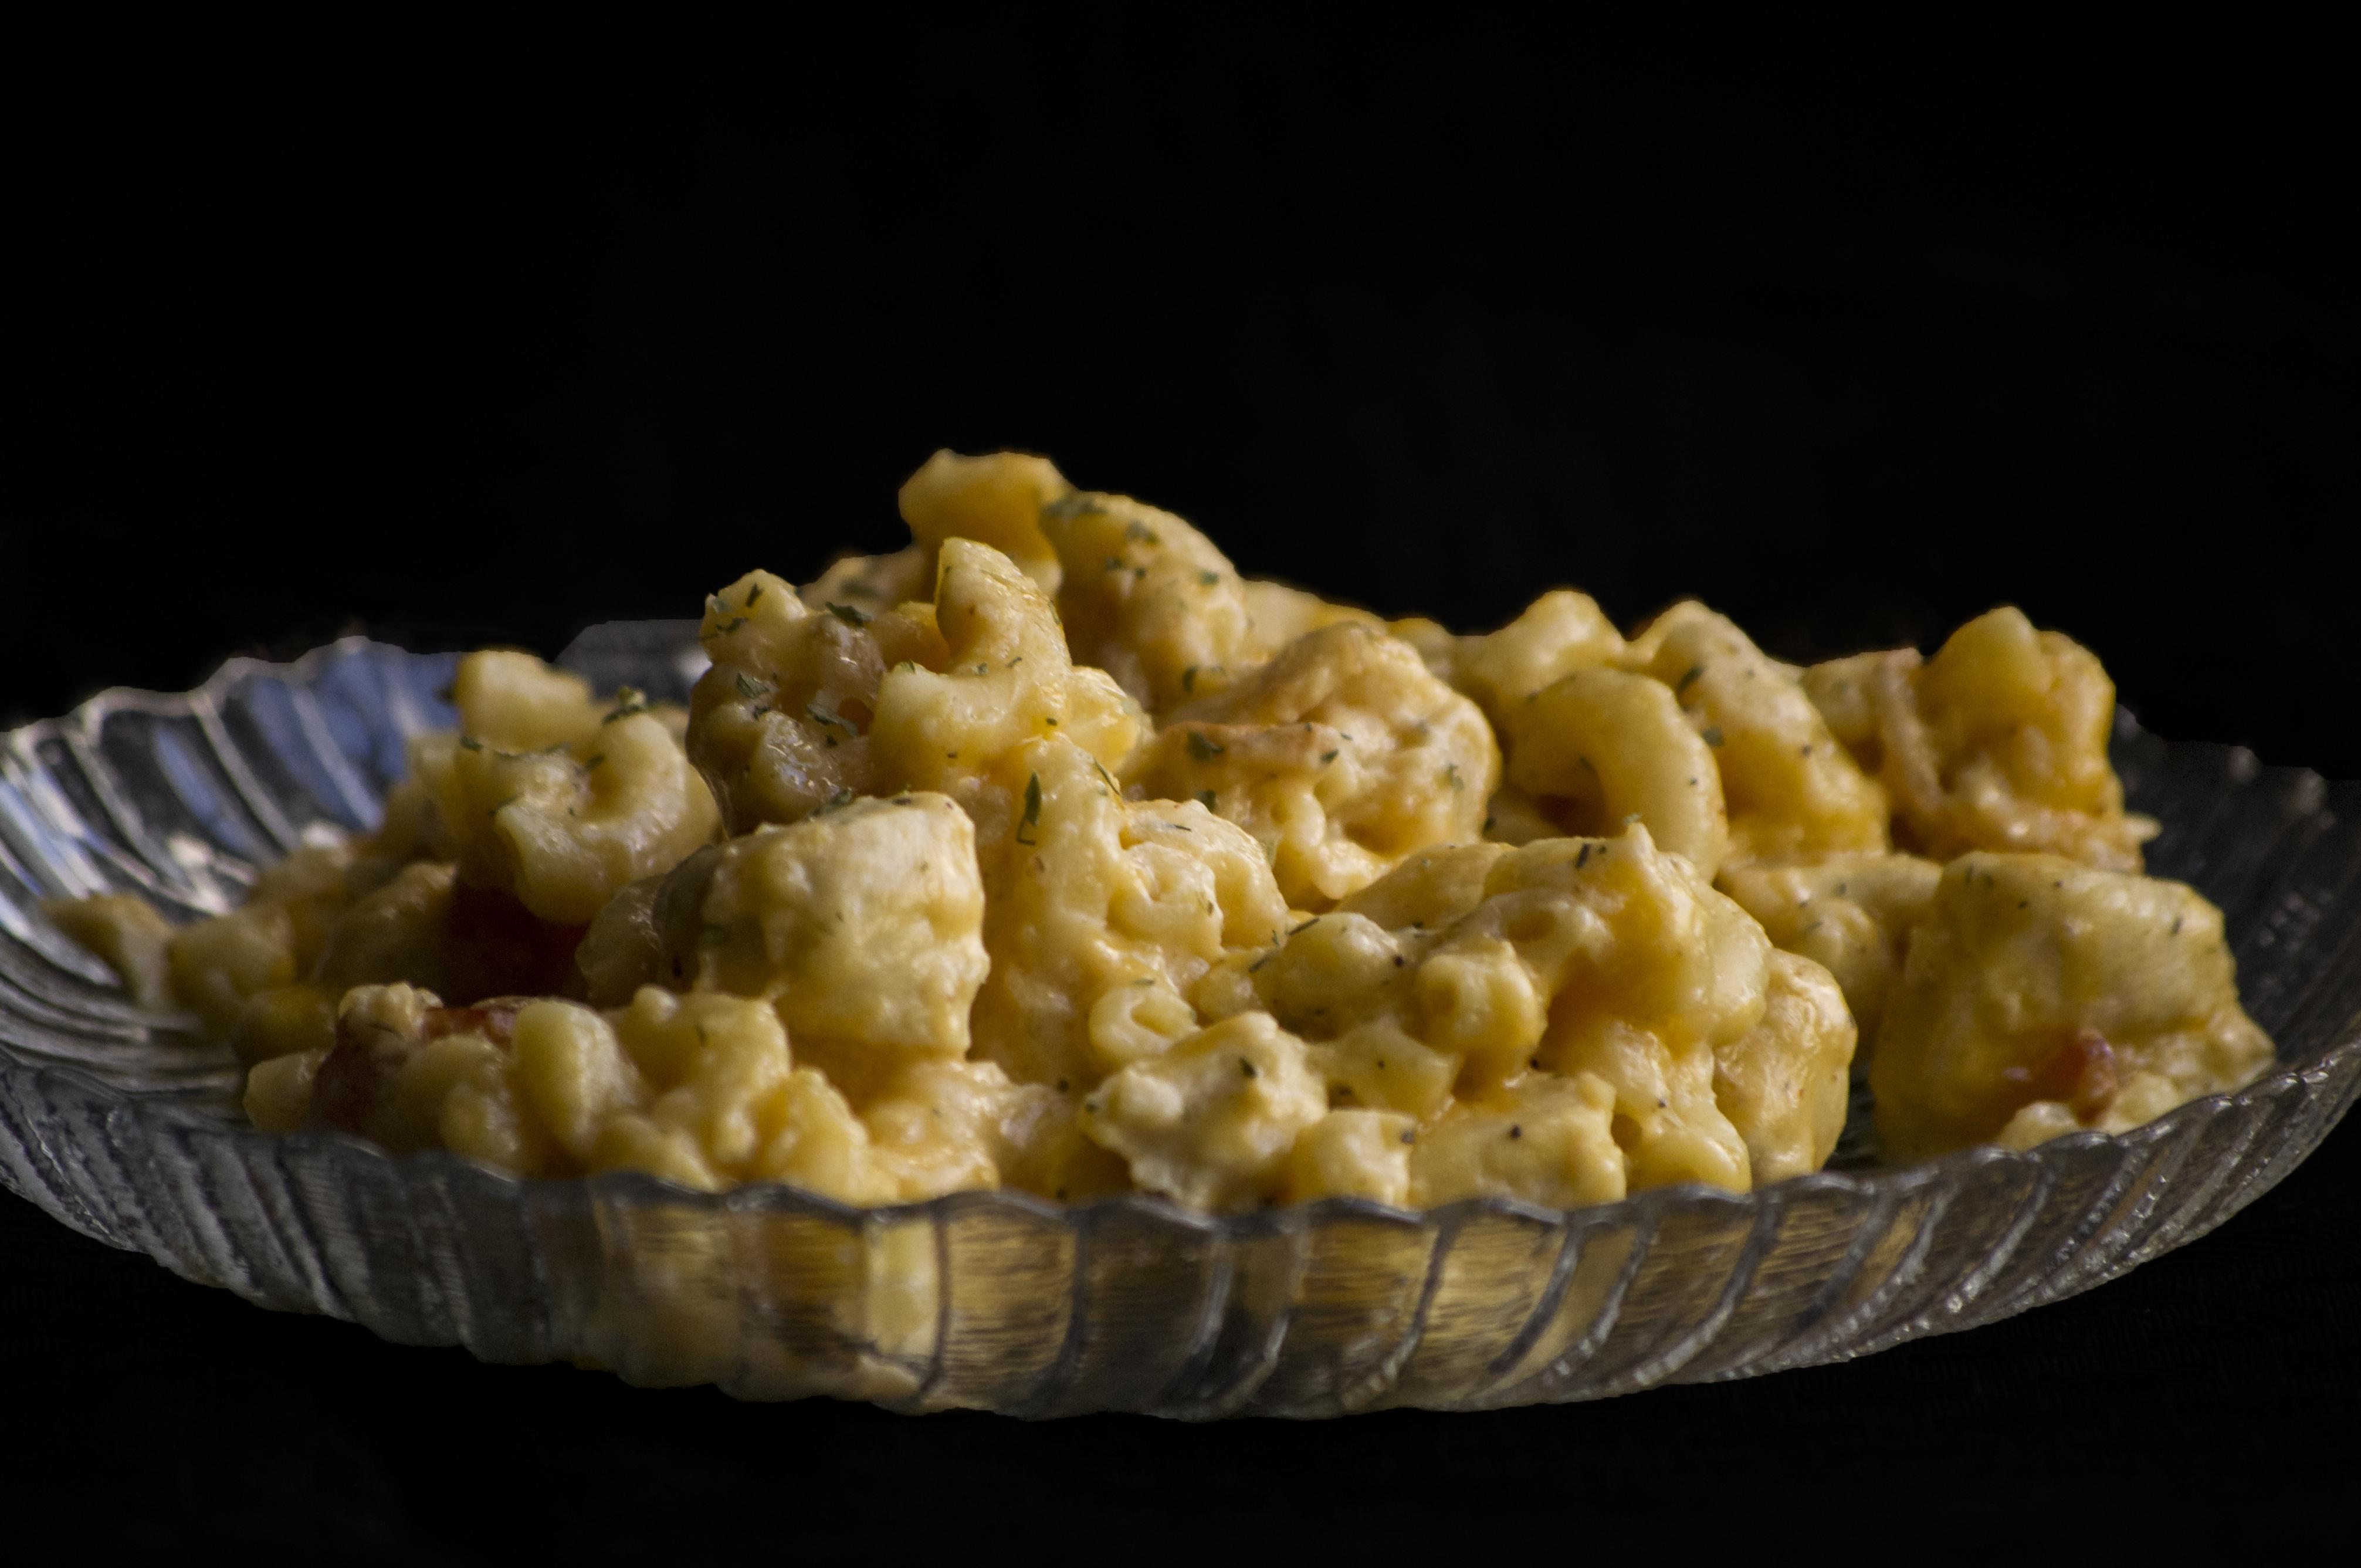 Cheesy pasta on plate photo